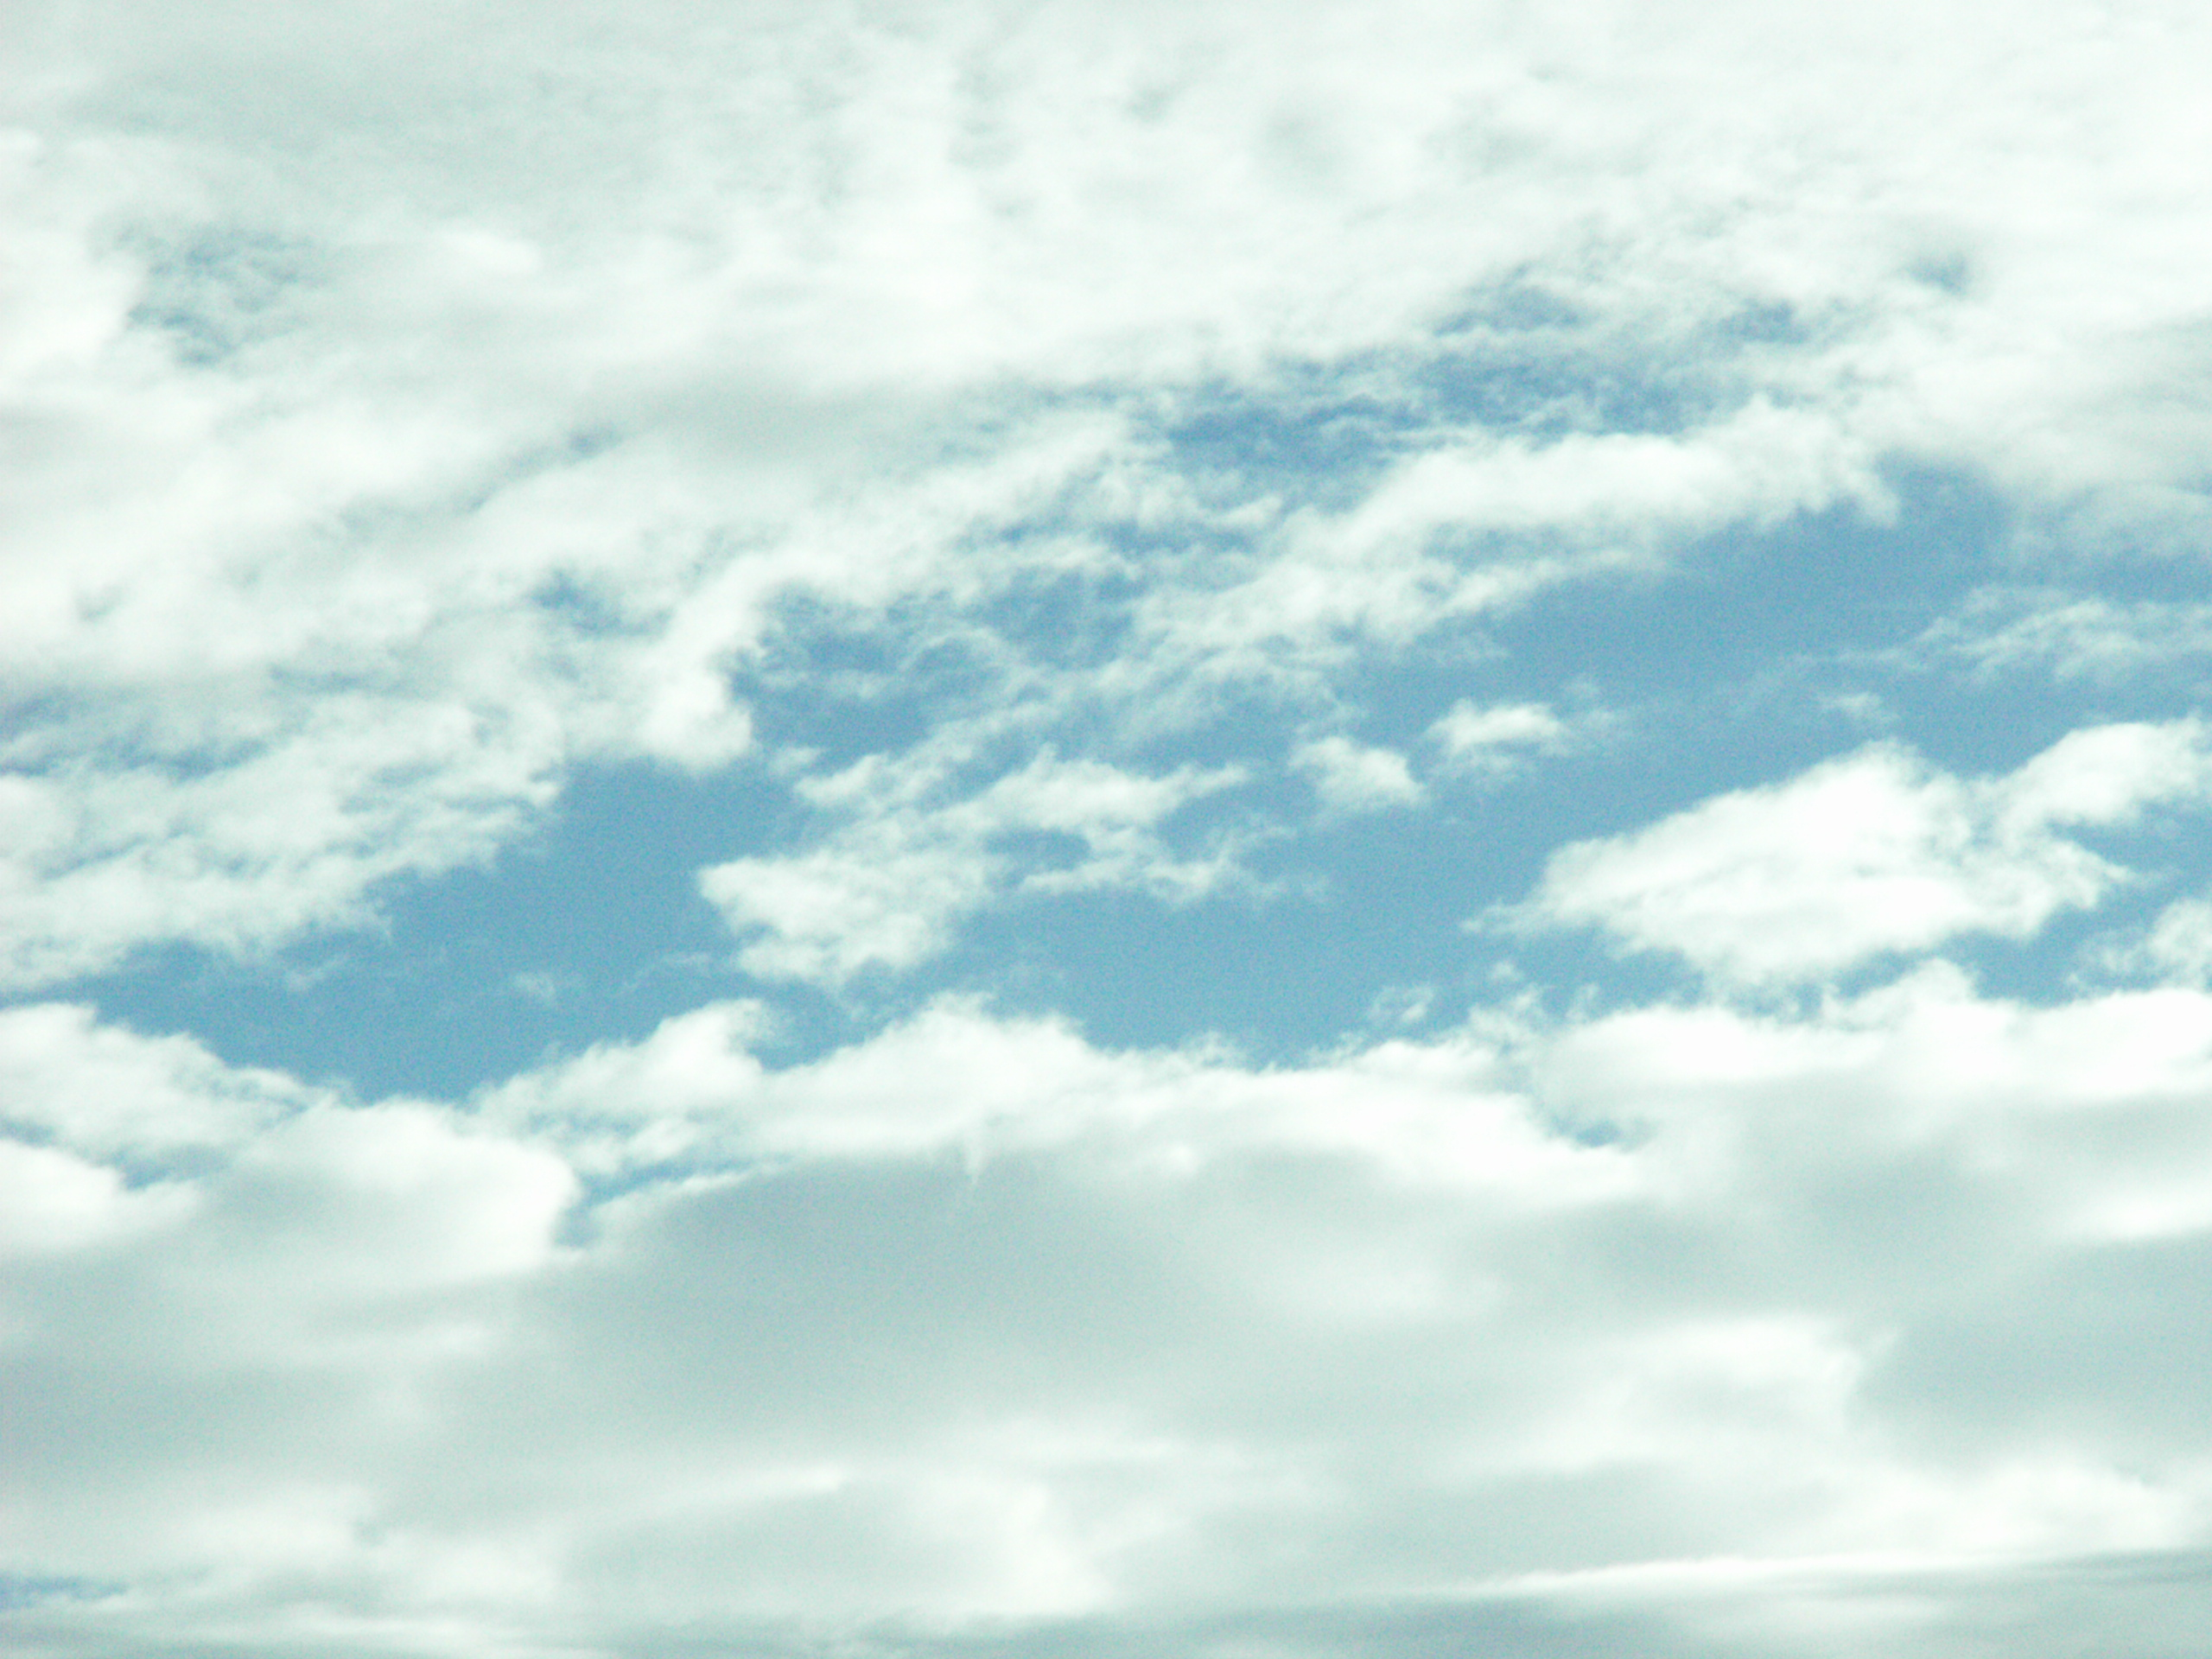 File nuages blanc ciel bleu clair jpg - Image ciel bleu clair ...